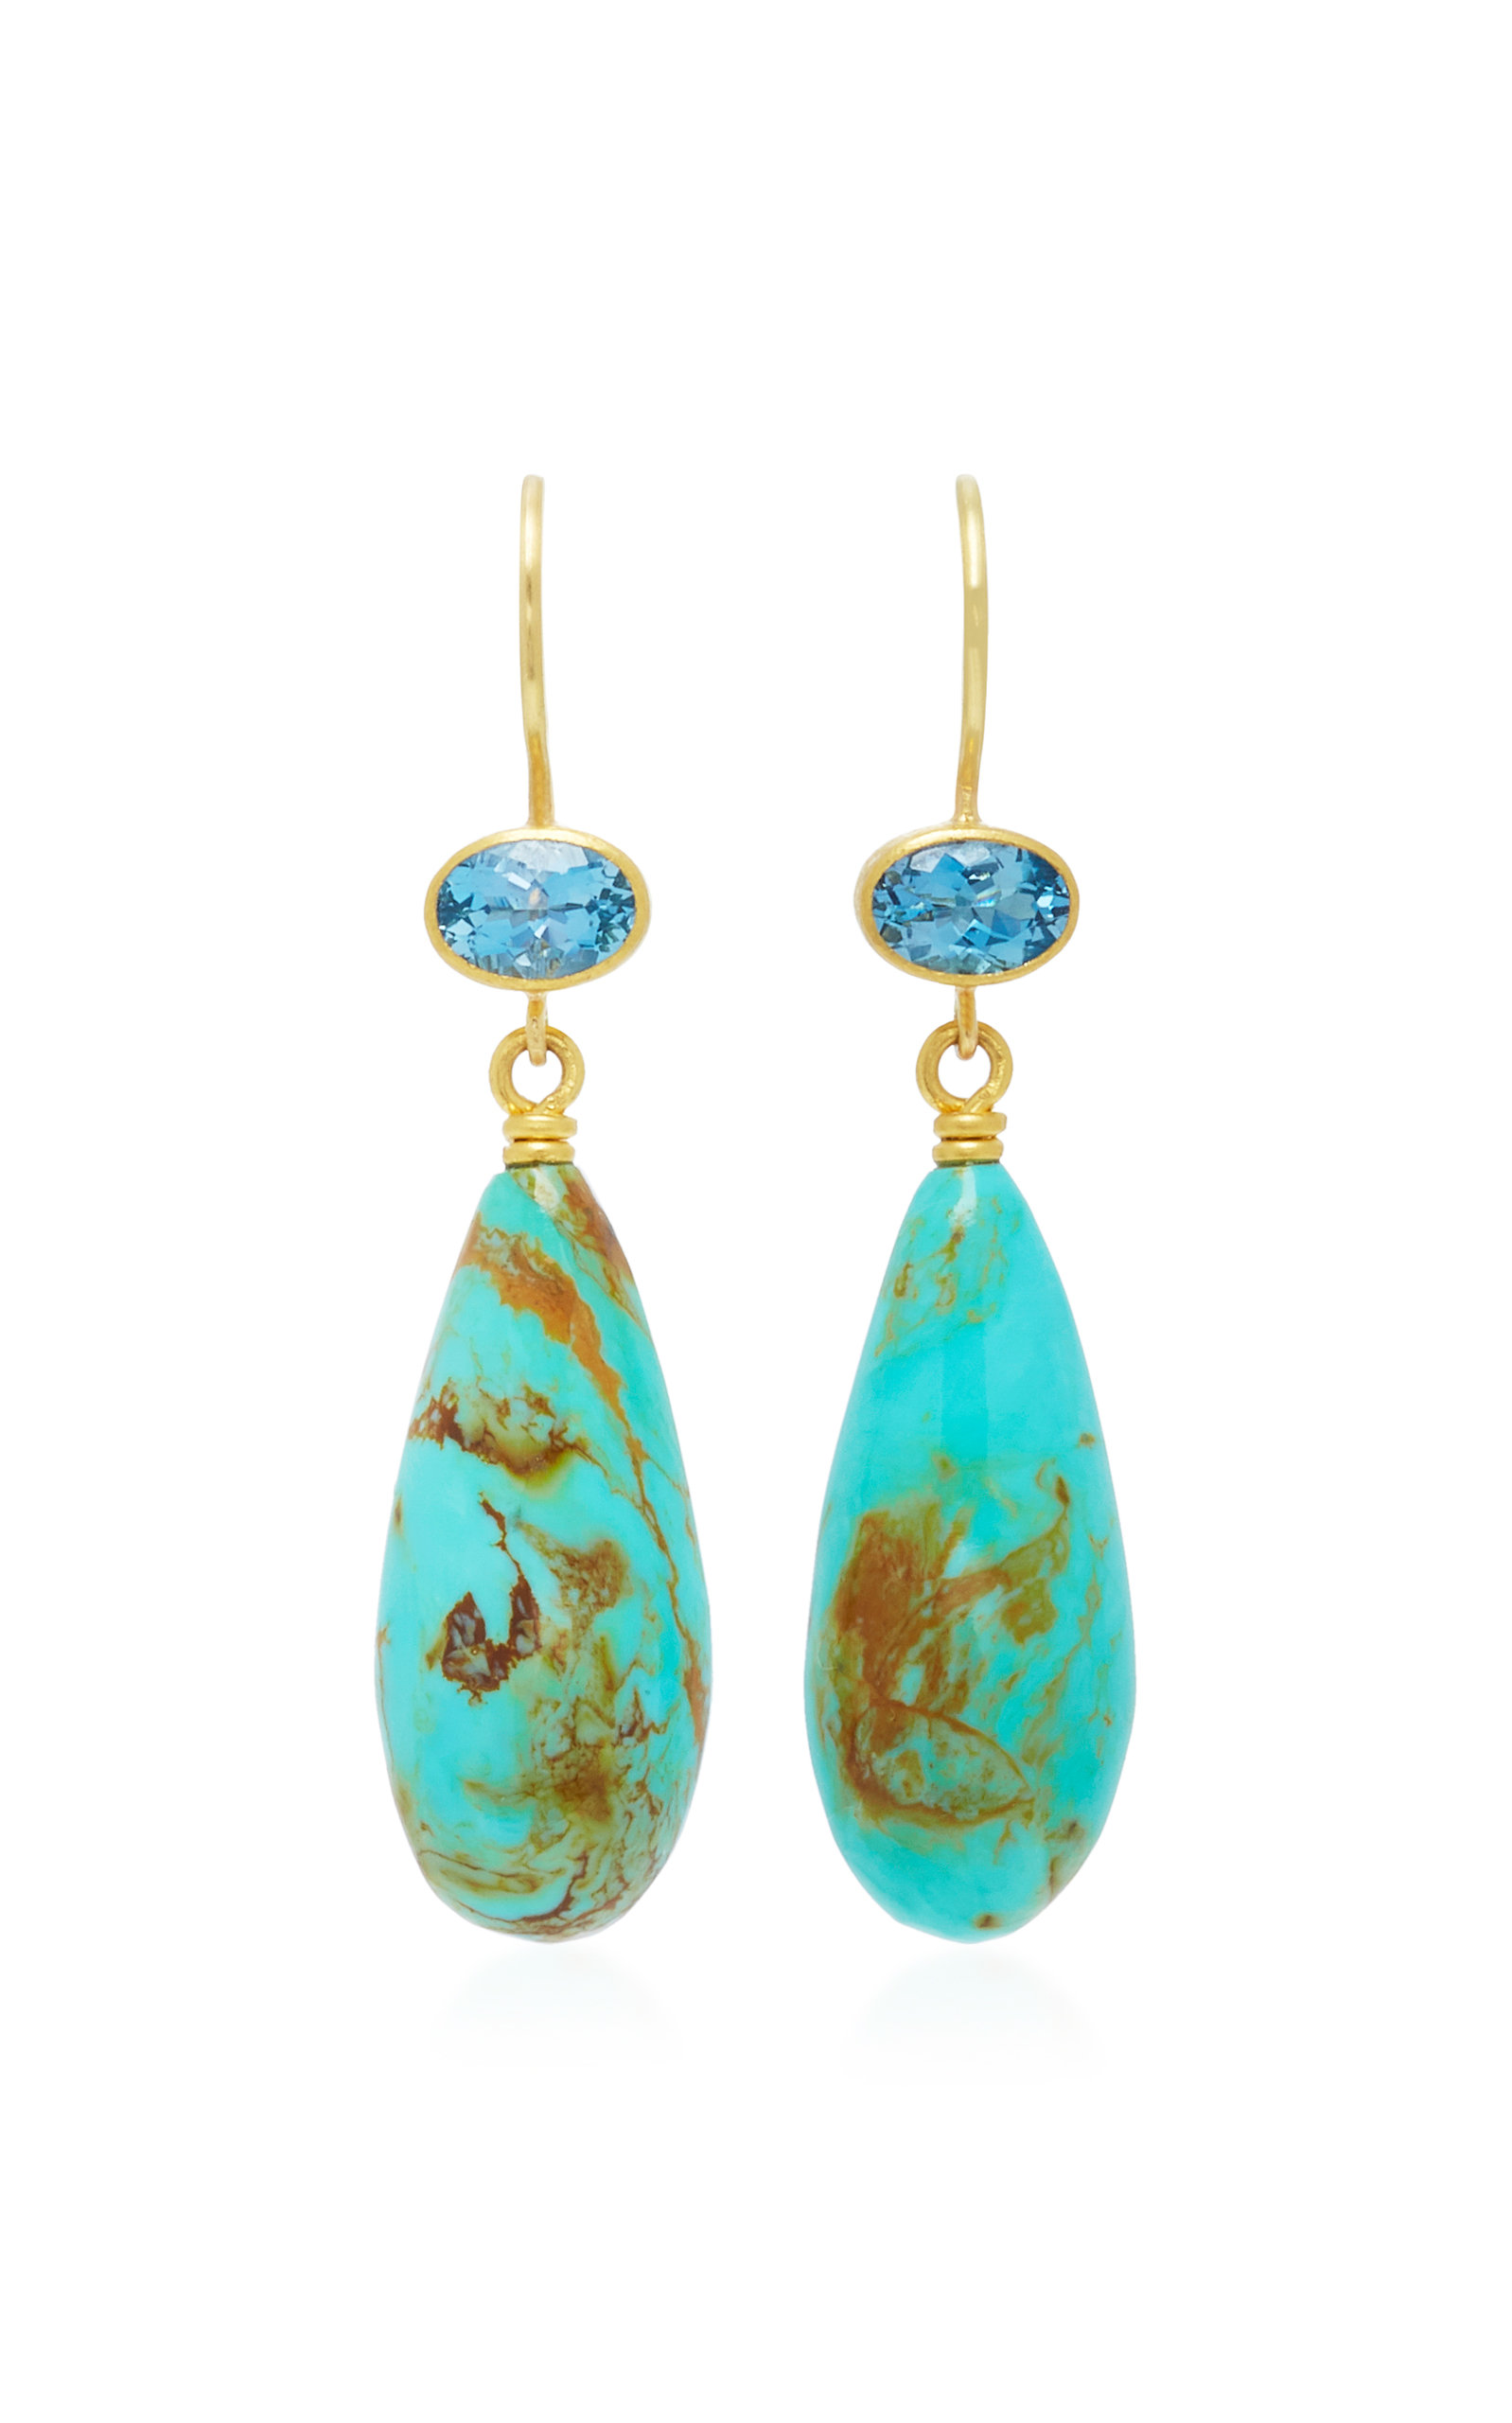 MALLARY MARKS APPLE & EVE 18K GOLD AQUAMARINE AND TURQUOISE EARRINGS